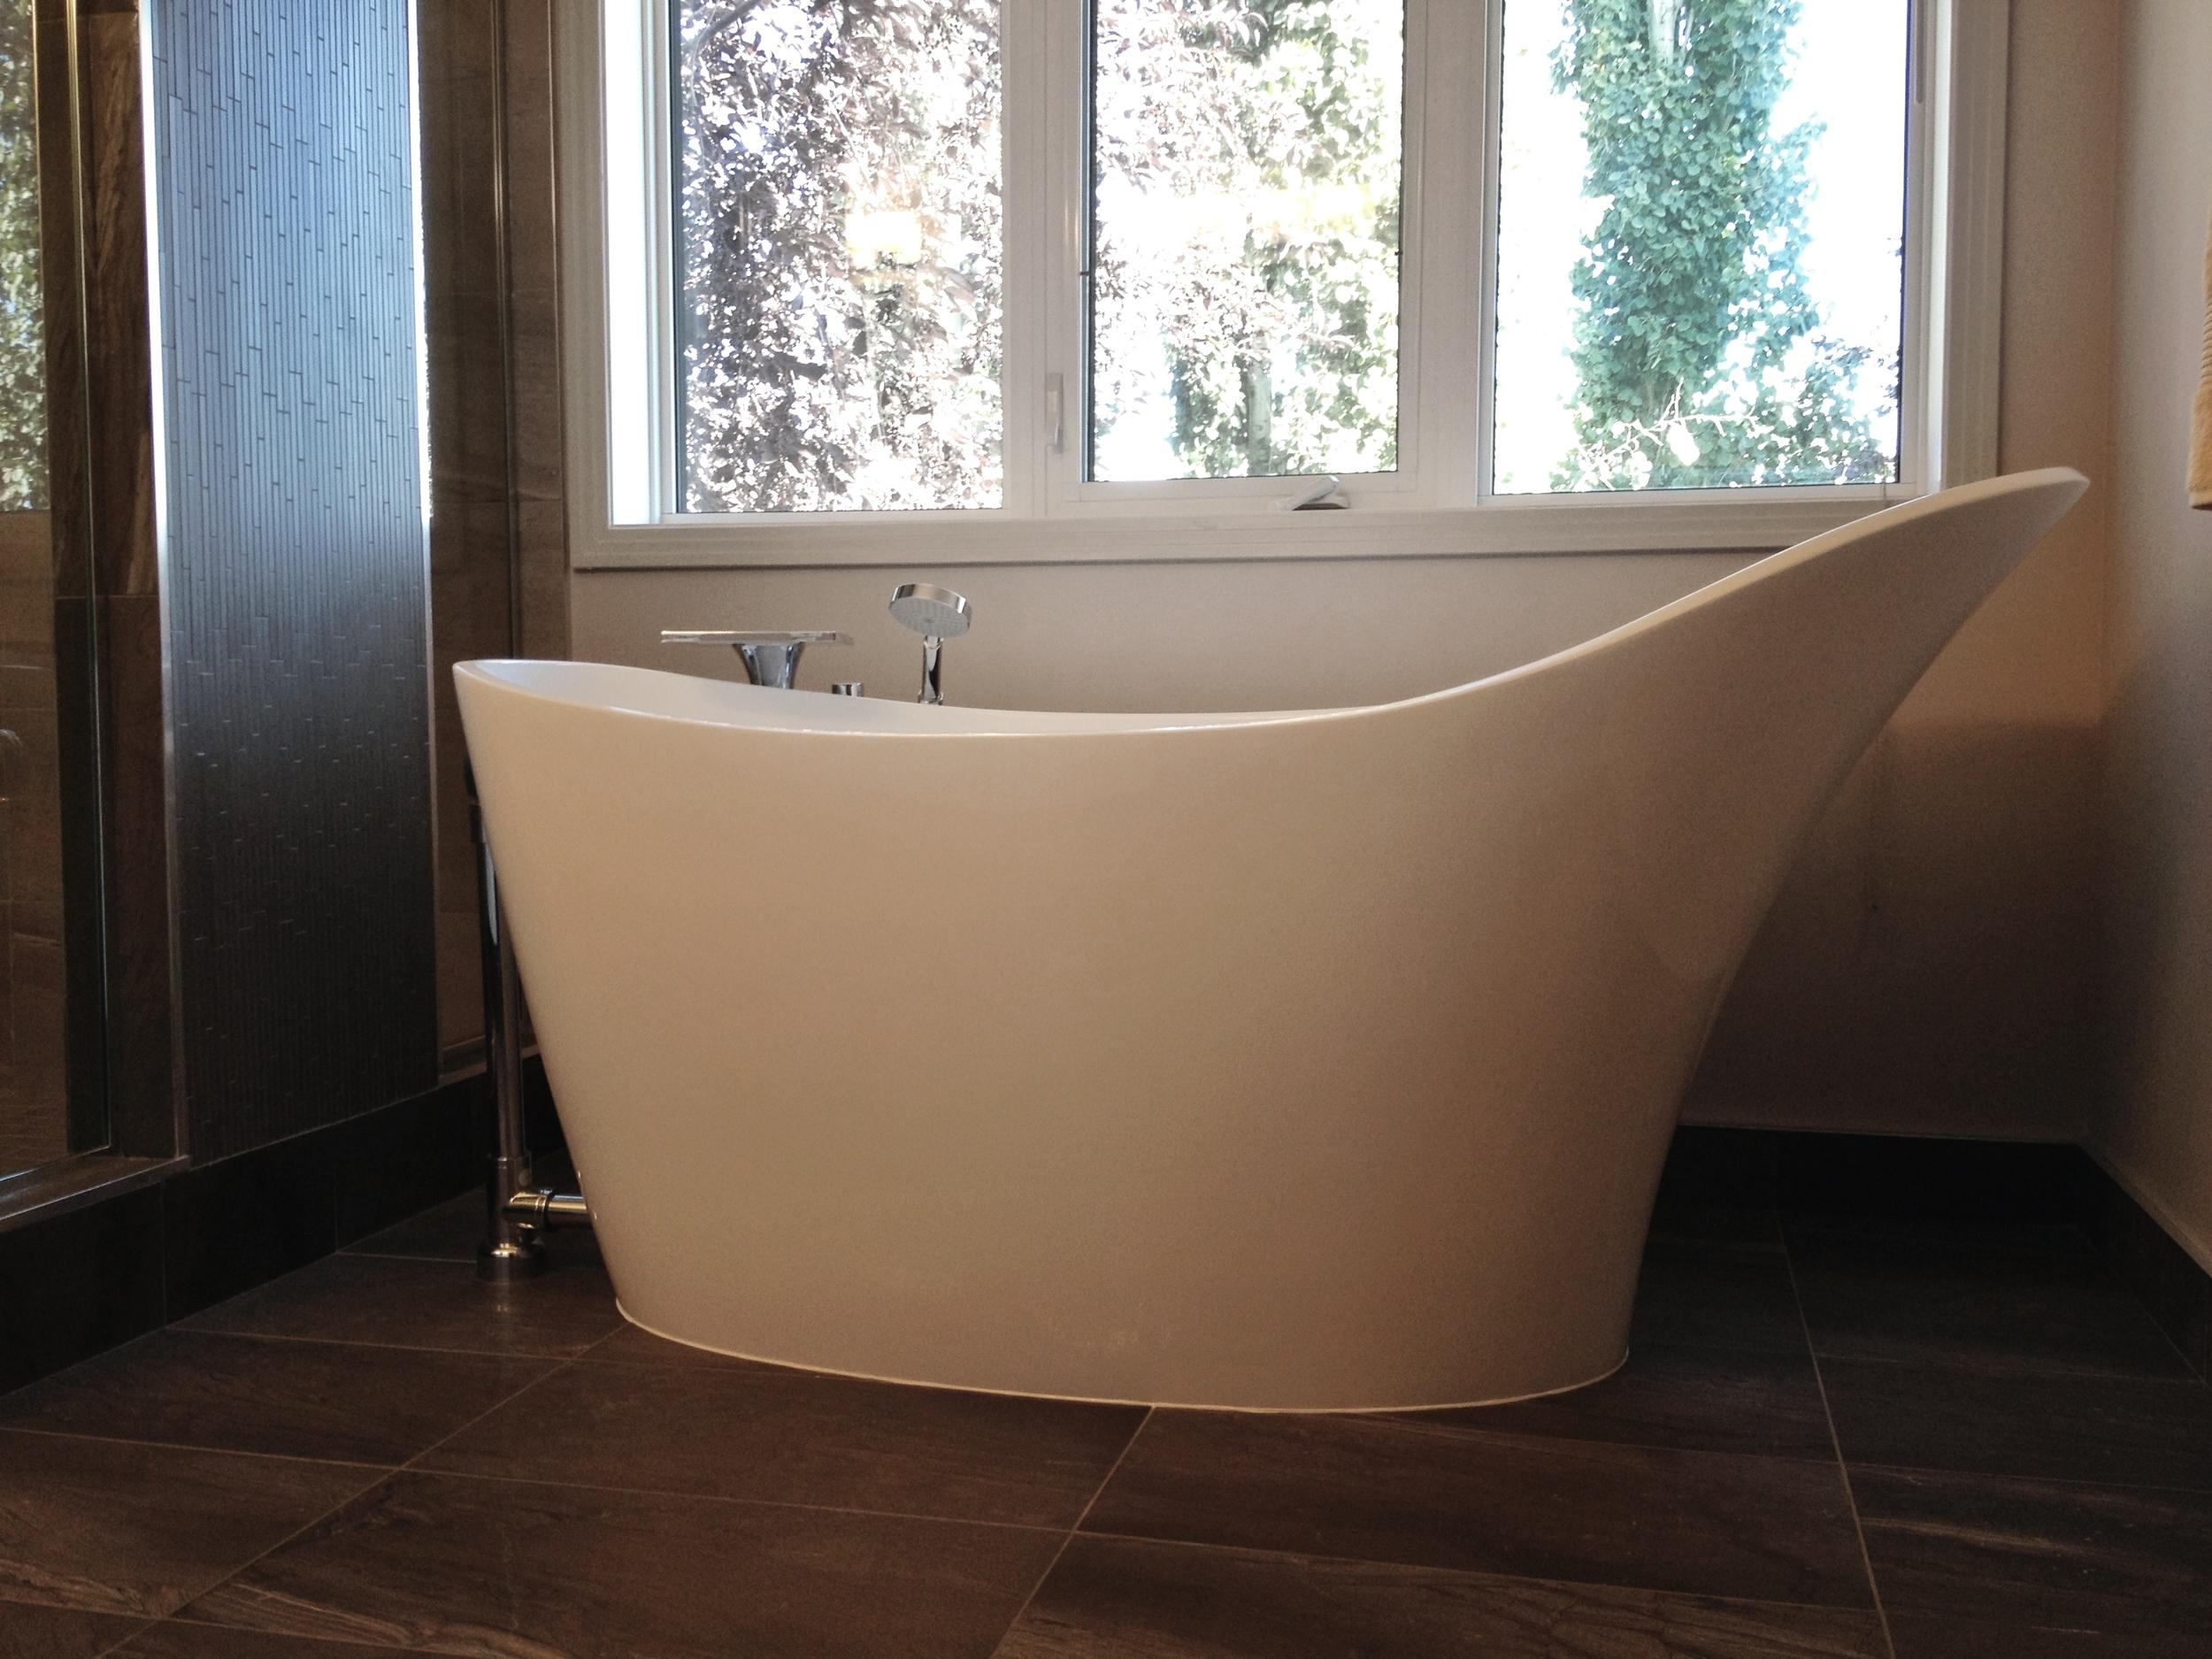 Freestanding volcanic limestone bathtub, Victoria and Albert.